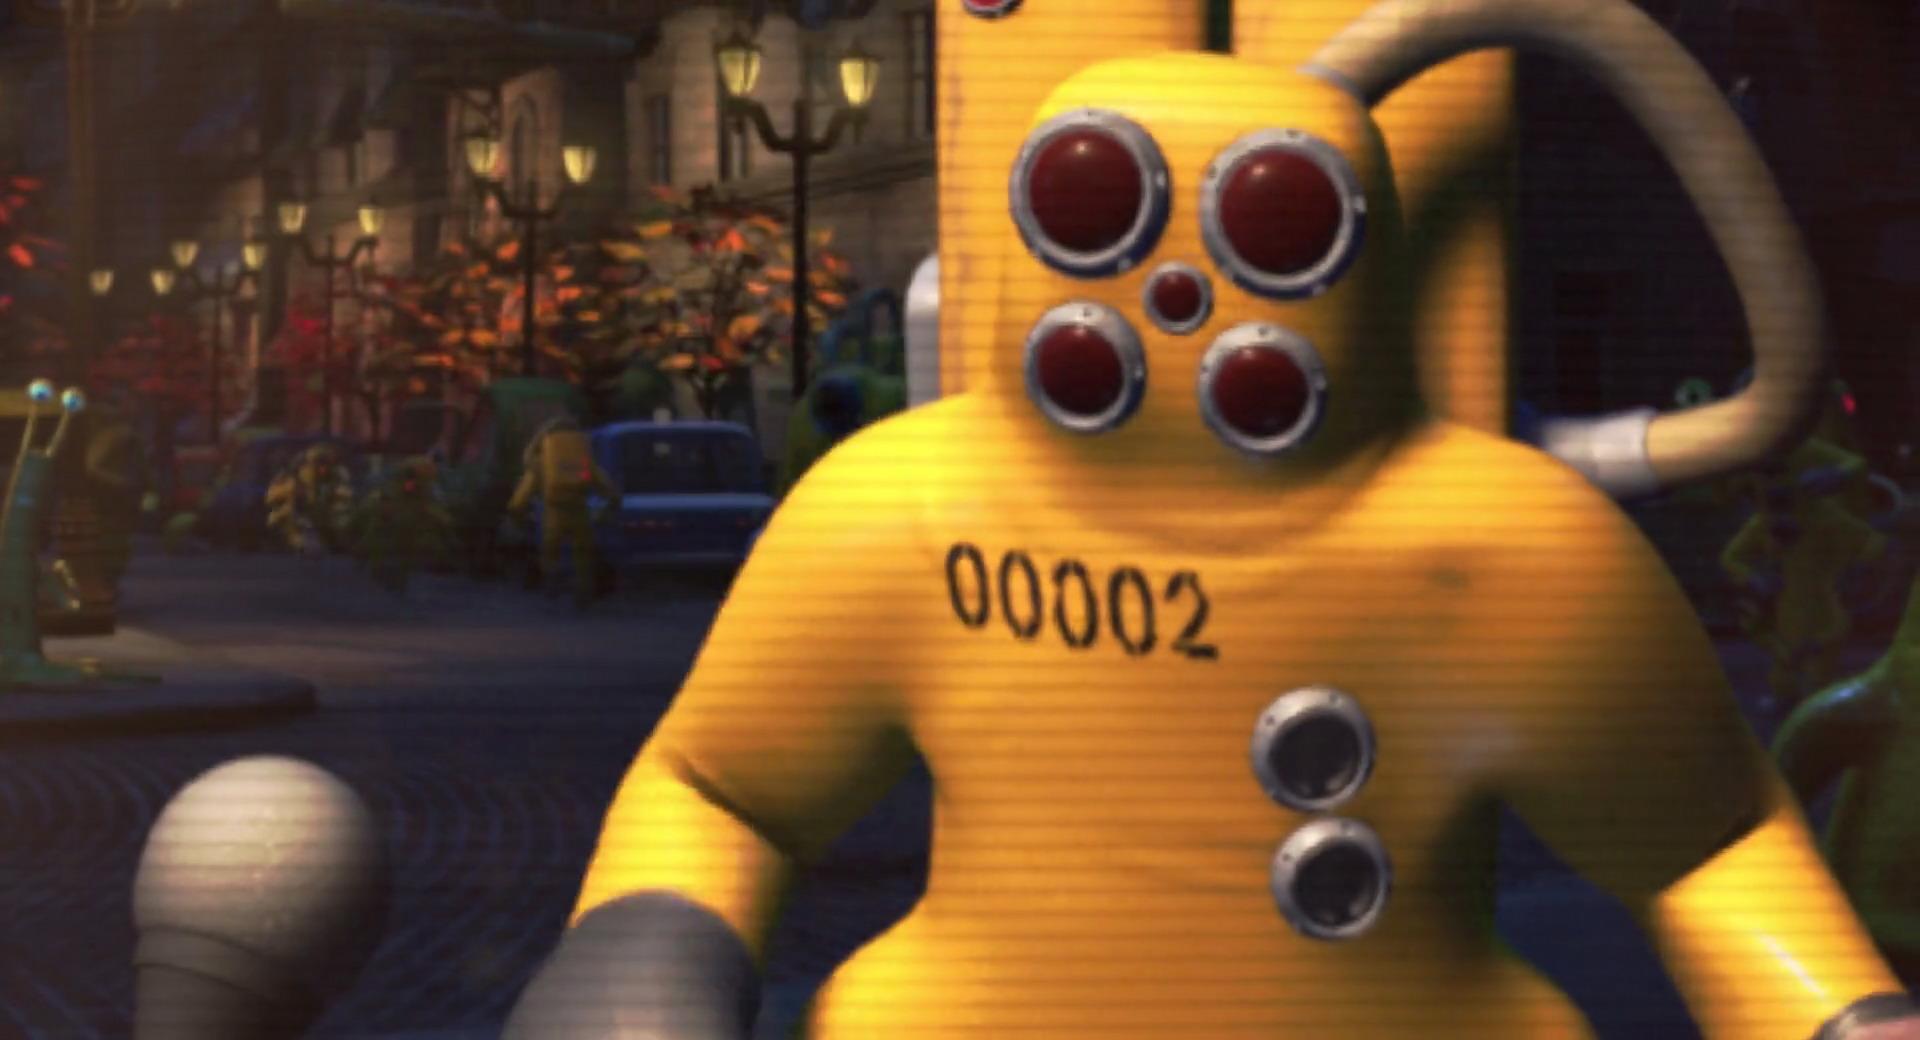 les agents de la cda personnages dans monstres cie pixar planet fr. Black Bedroom Furniture Sets. Home Design Ideas